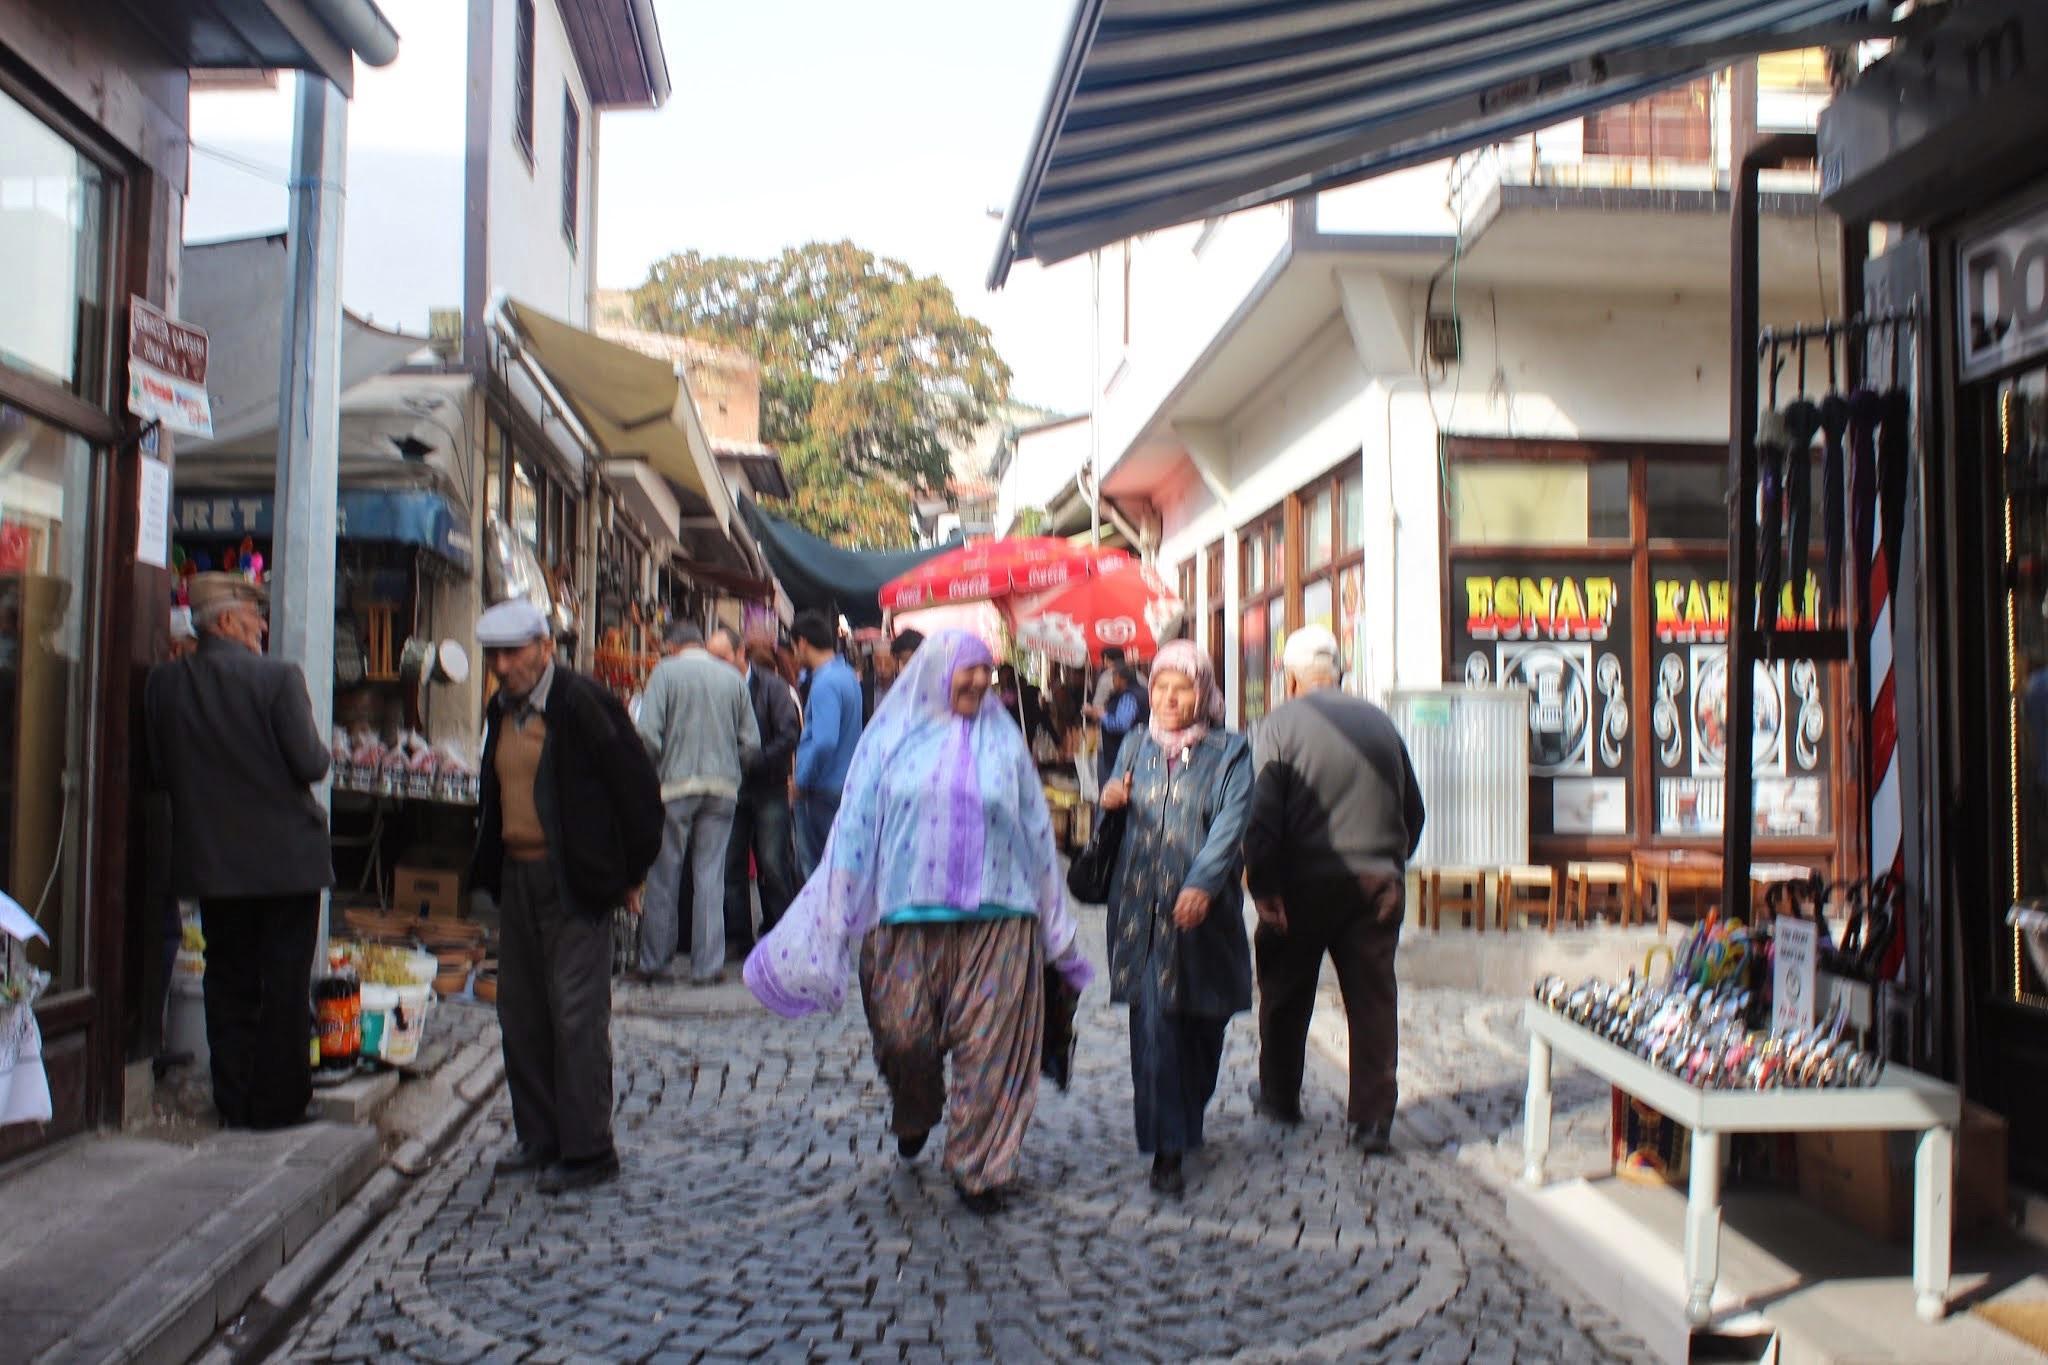 Local people in Beypazarı by Meriç Aksu